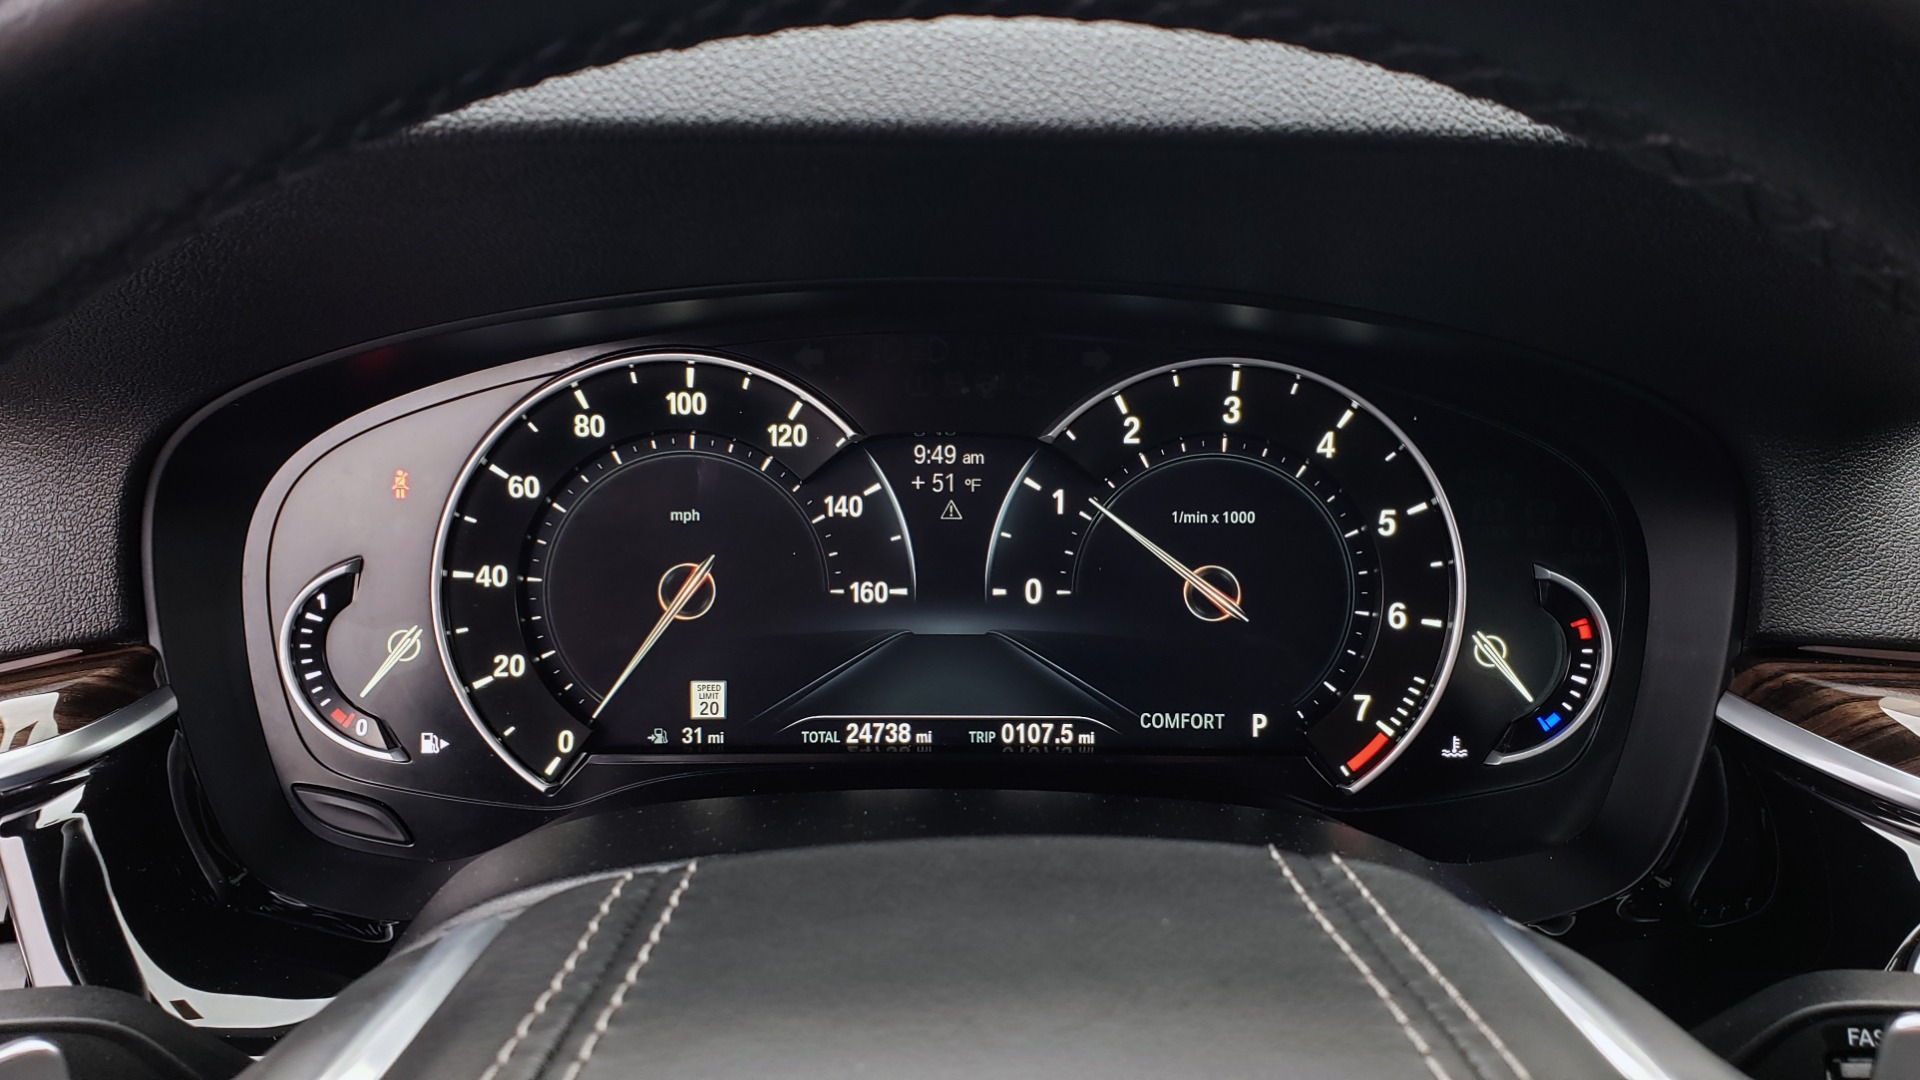 Used 2017 BMW 5 SERIES 530IXDRIVE / PREM PKG / DRVR ASST PLUS / CLD WTHR / APPLE CARPLAY for sale Sold at Formula Imports in Charlotte NC 28227 40